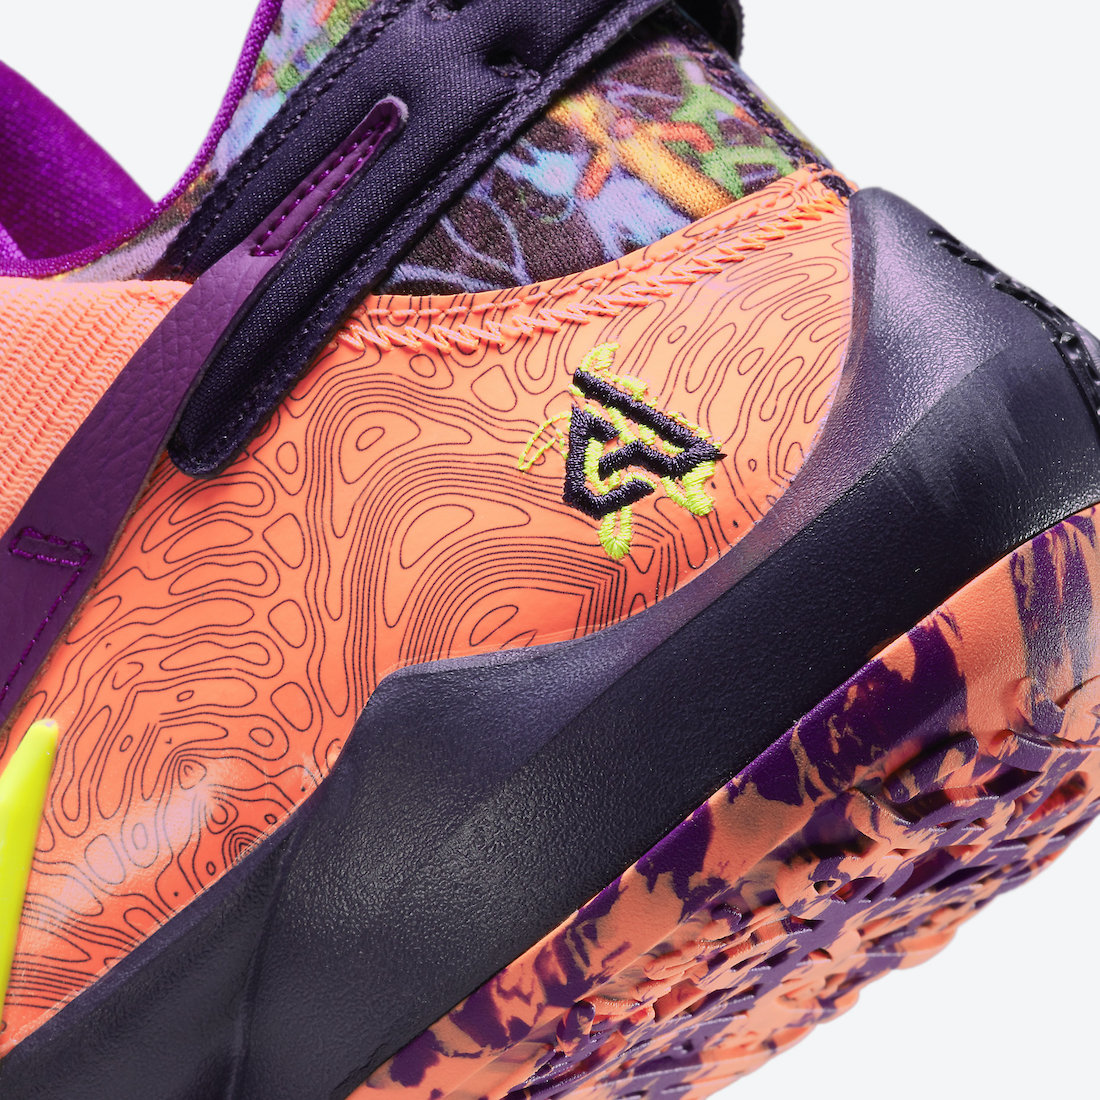 Nike-Zoom-Freak-2-Bright-Mango-CW3162-800-Release-Date-7